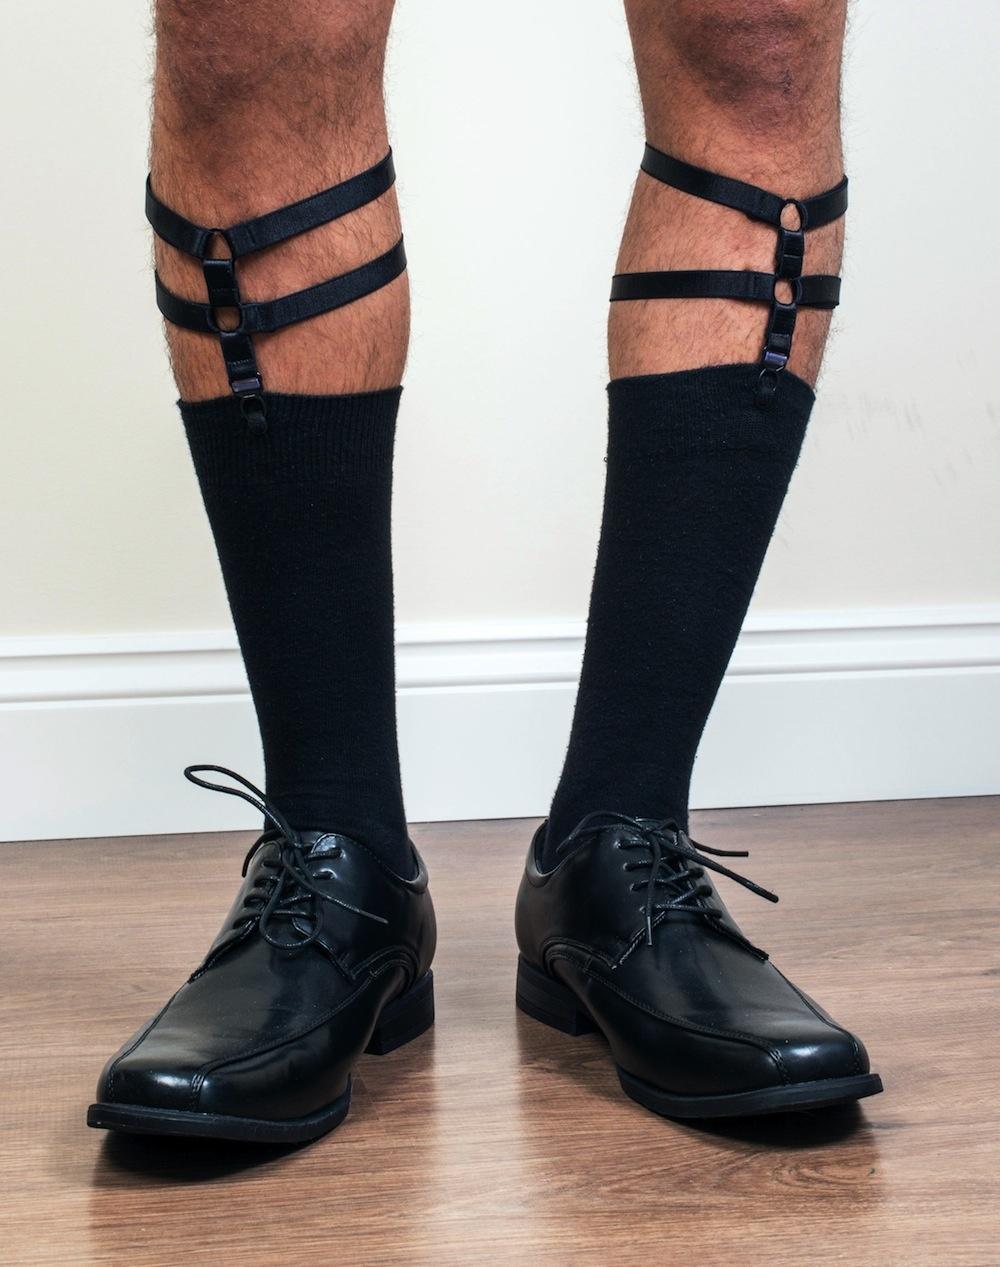 Men's Socks: The Quintessential Guide I The GentleManual